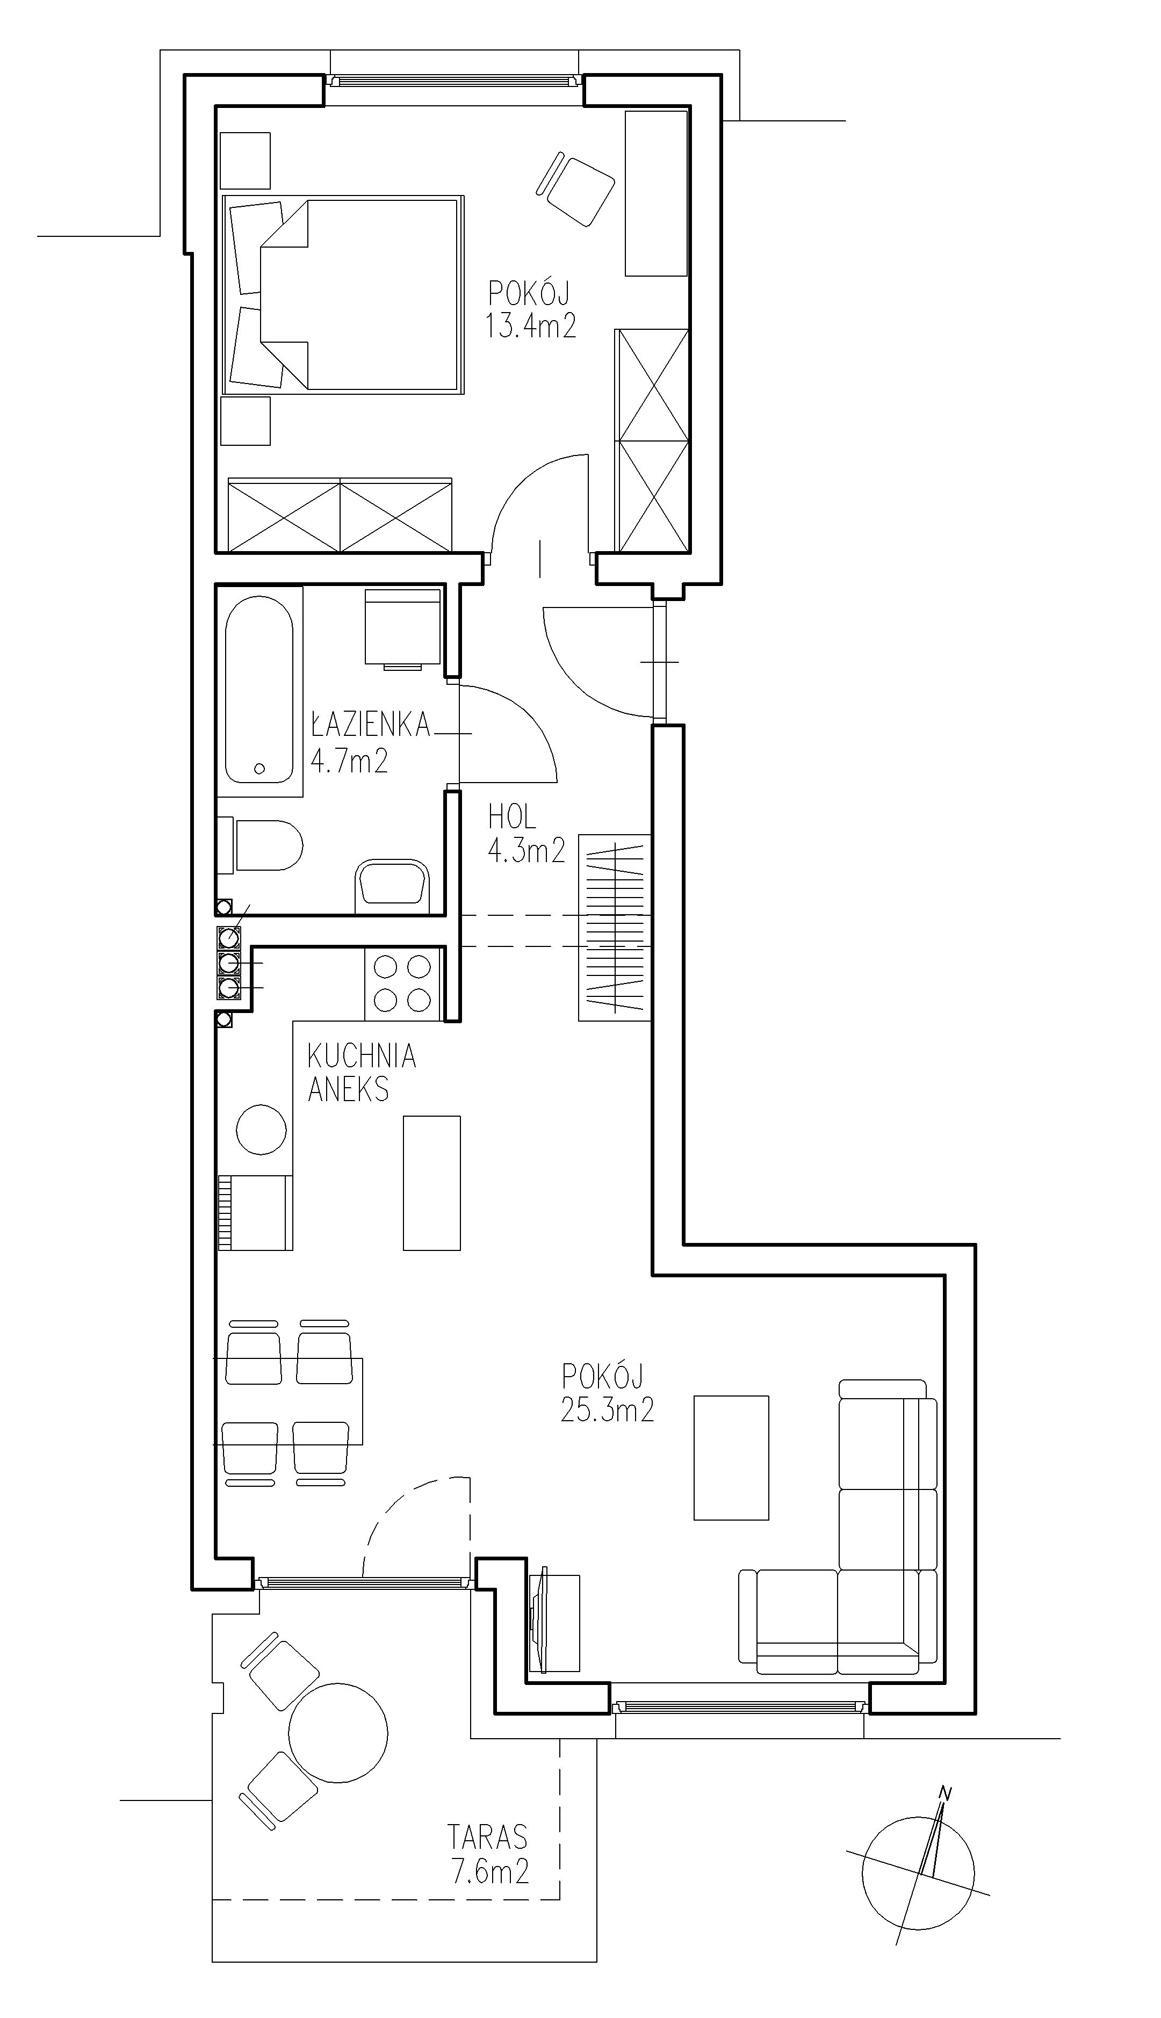 Mieszkanie nr 2 | Blok nr 1 | ul. Ogrodowa | Ełk